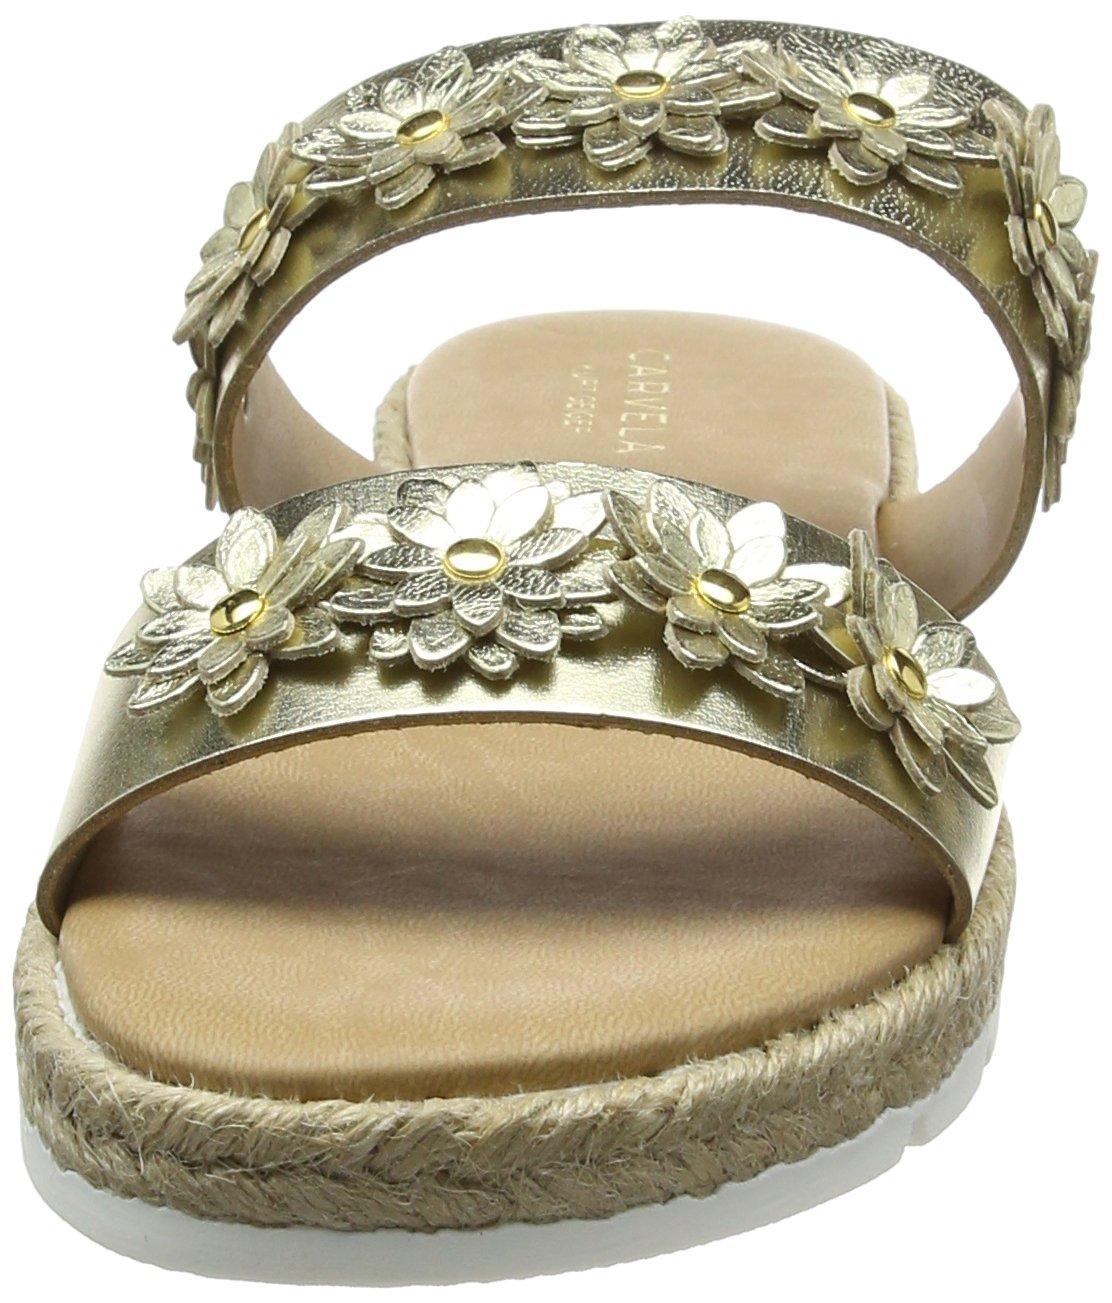 Carvela Damen NP Klaim NP Damen Sandalen Gold (Gold) 67b74c